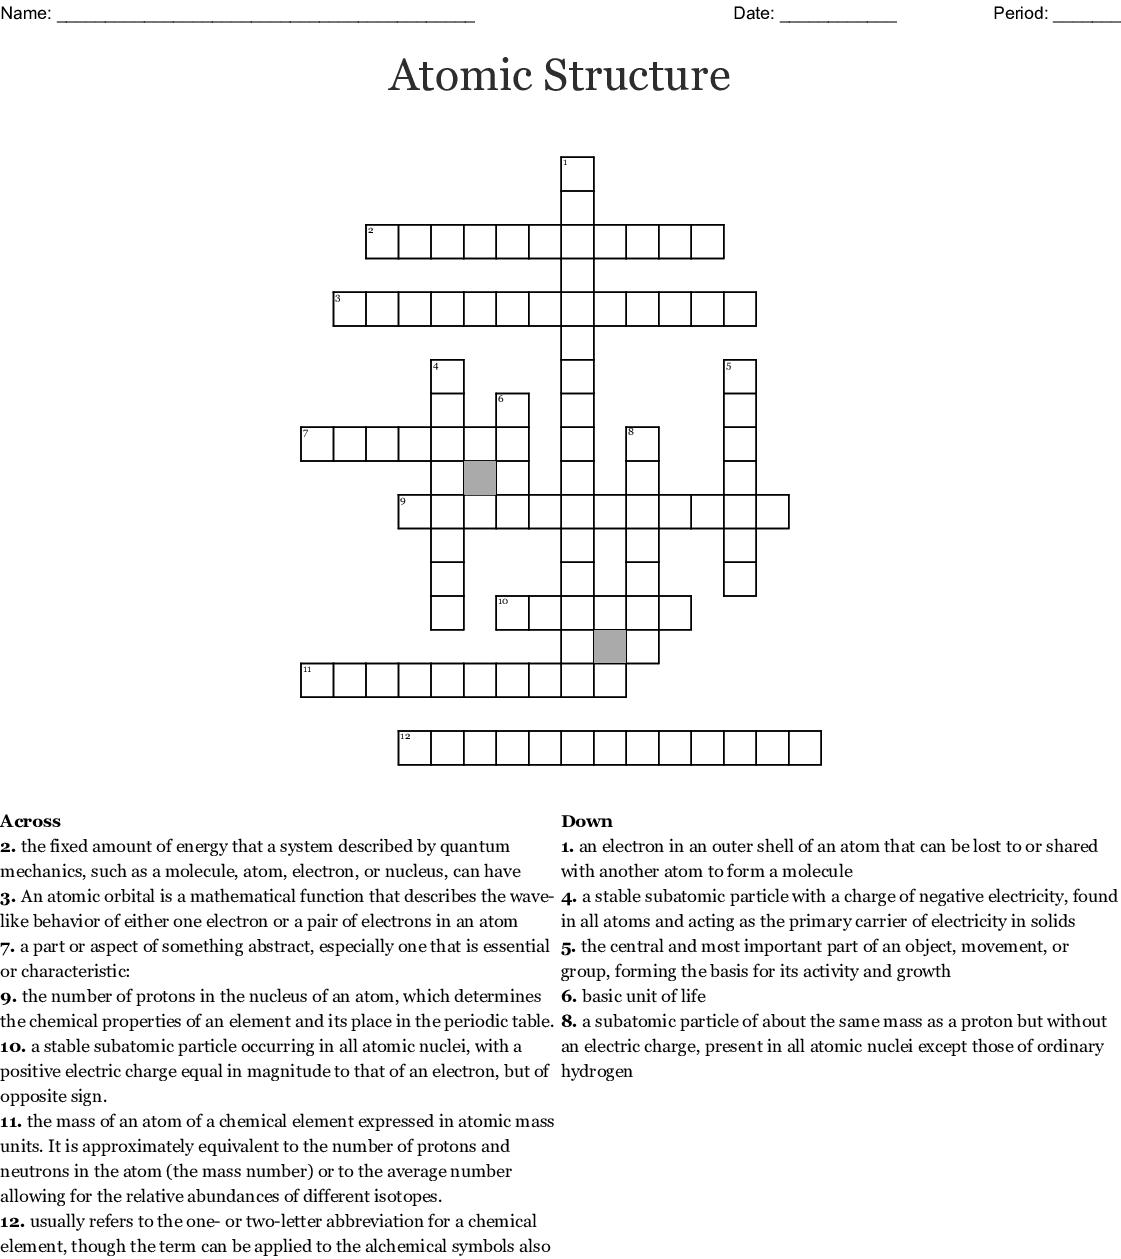 Atomic Structure Crossword